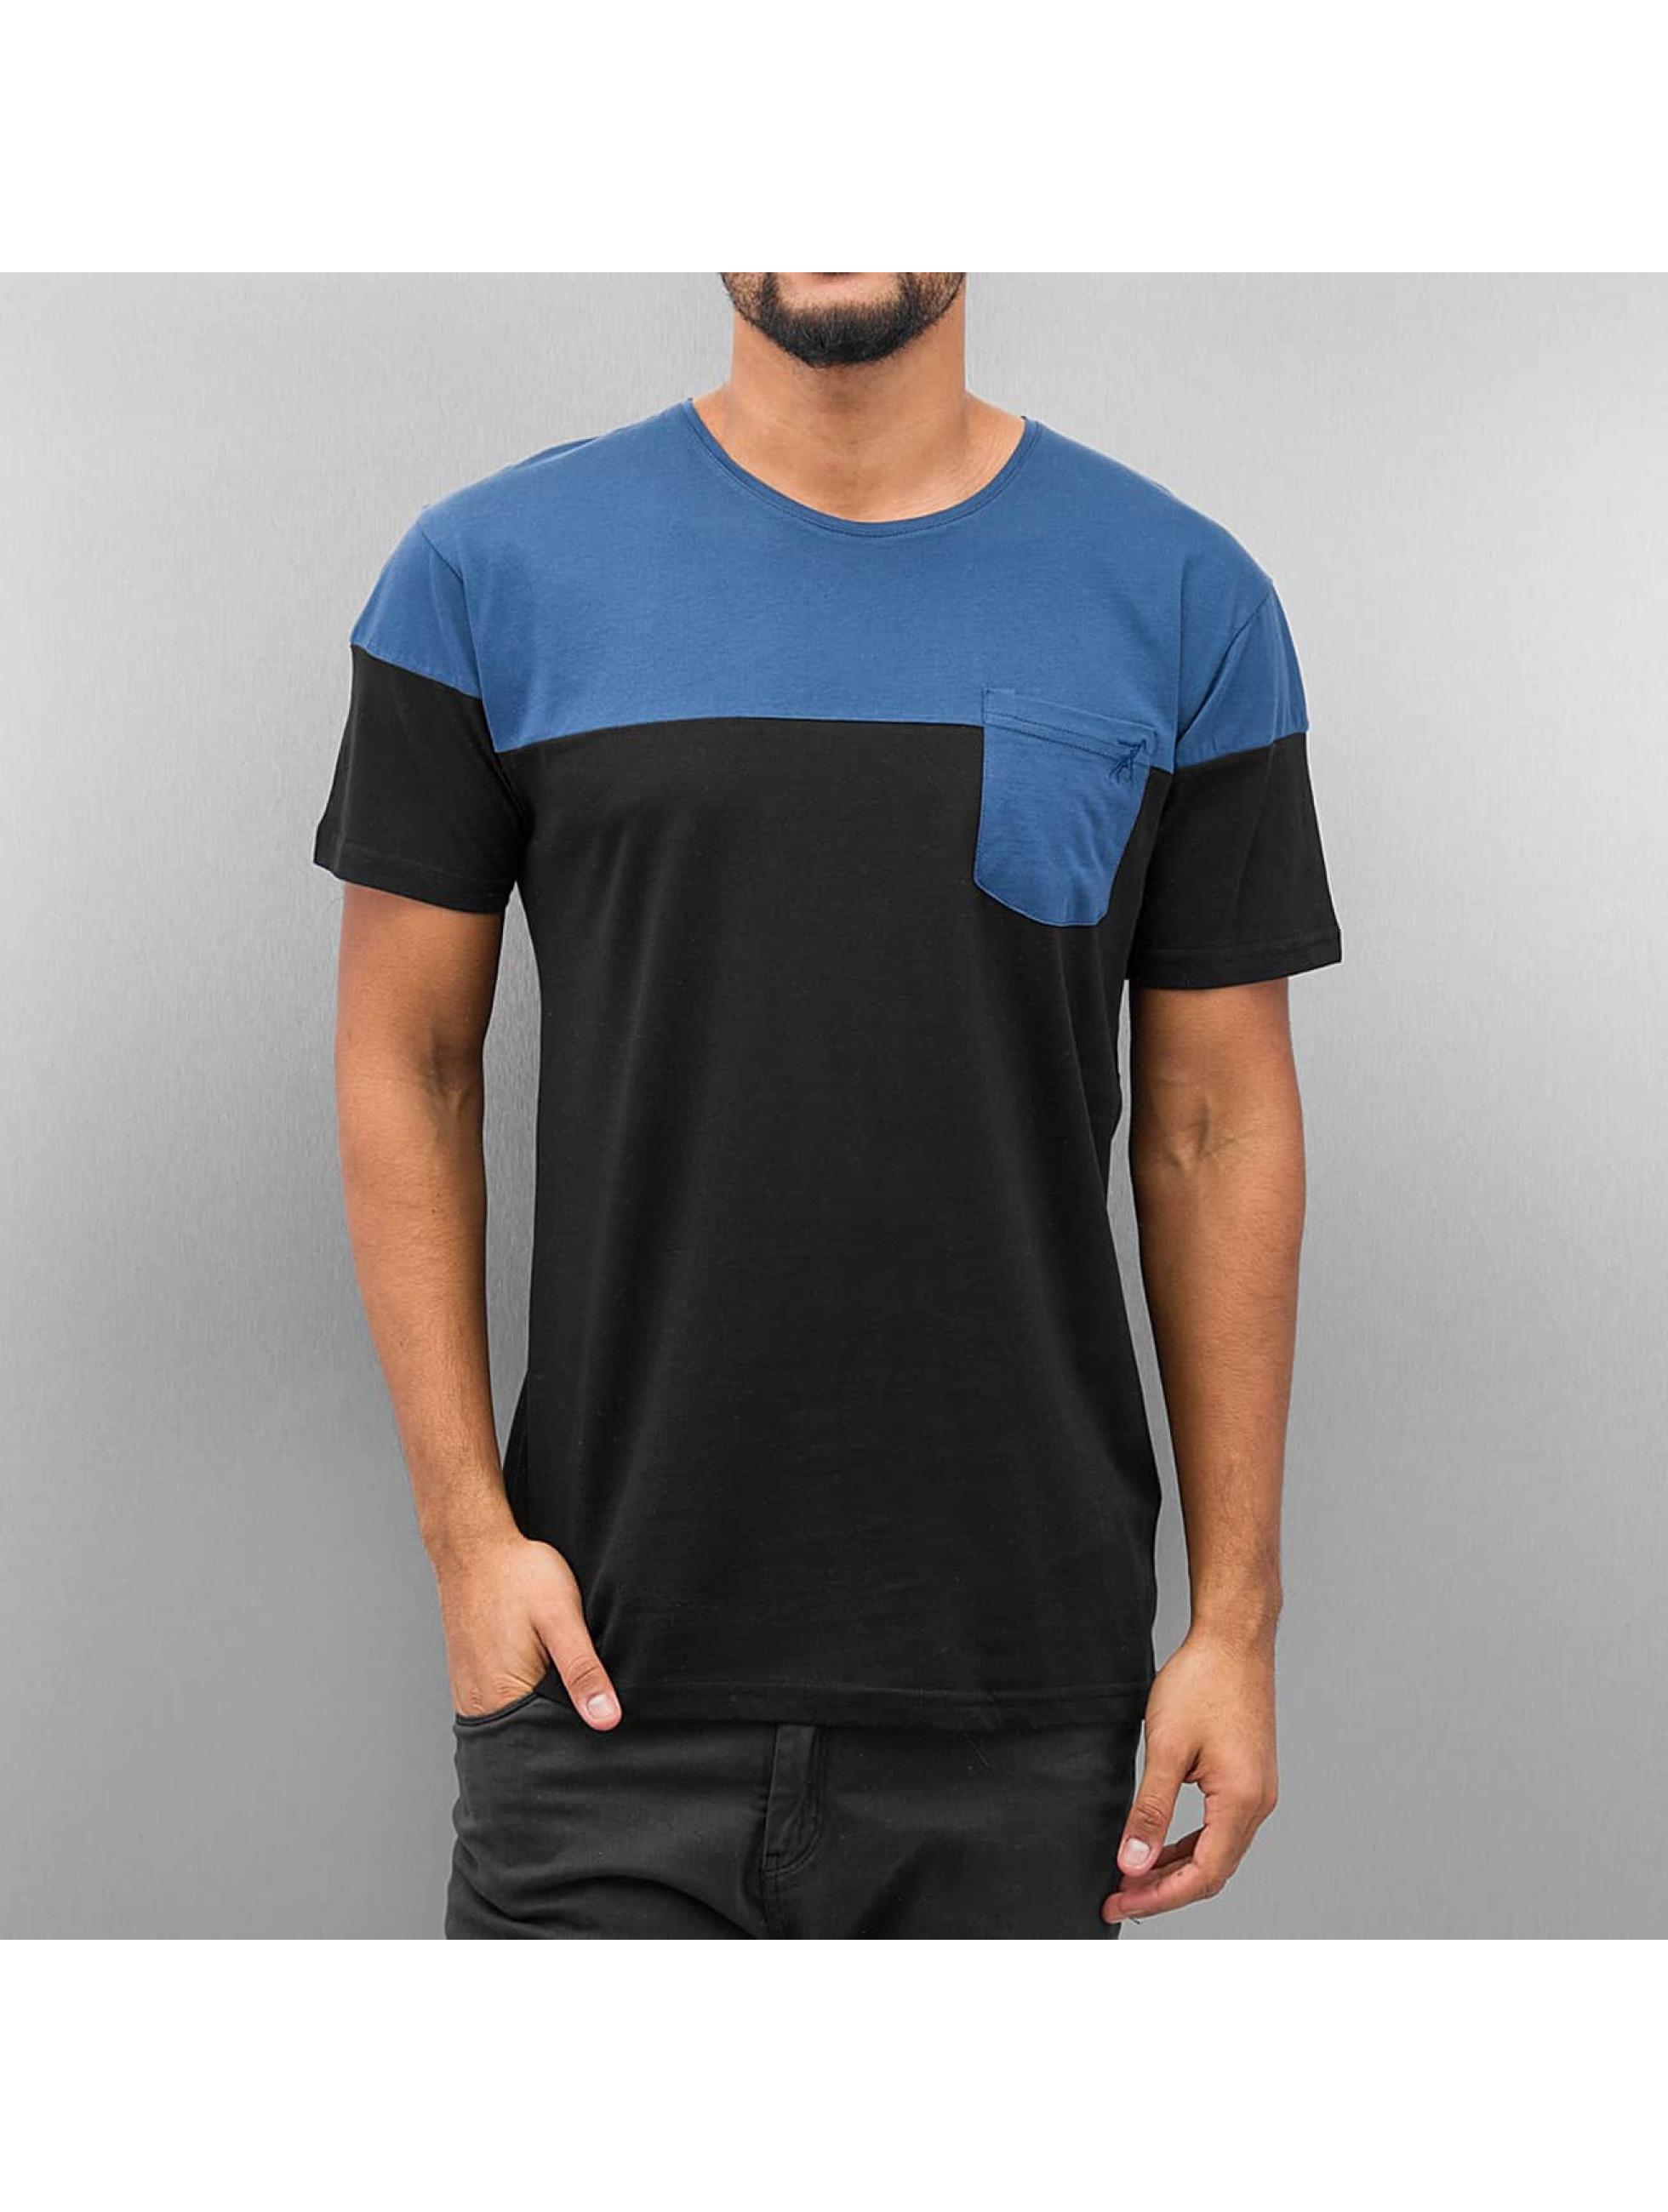 Cazzy Clang Männer T-Shirt Breast Pocket in schwarz